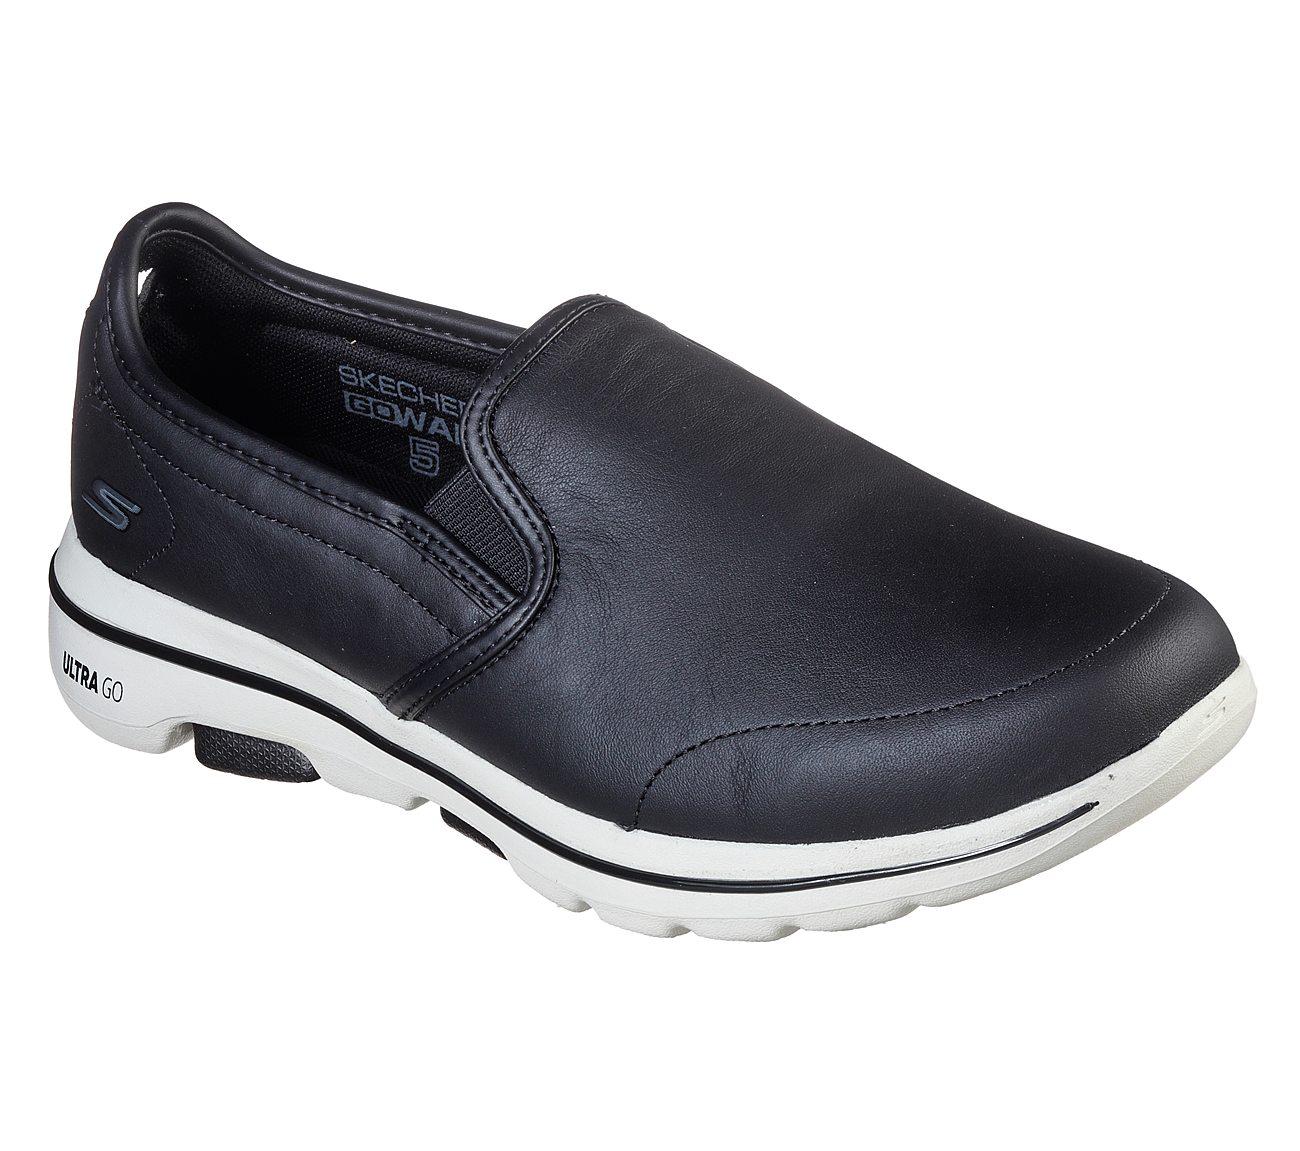 Skechers GOwalk 5 - Convinced